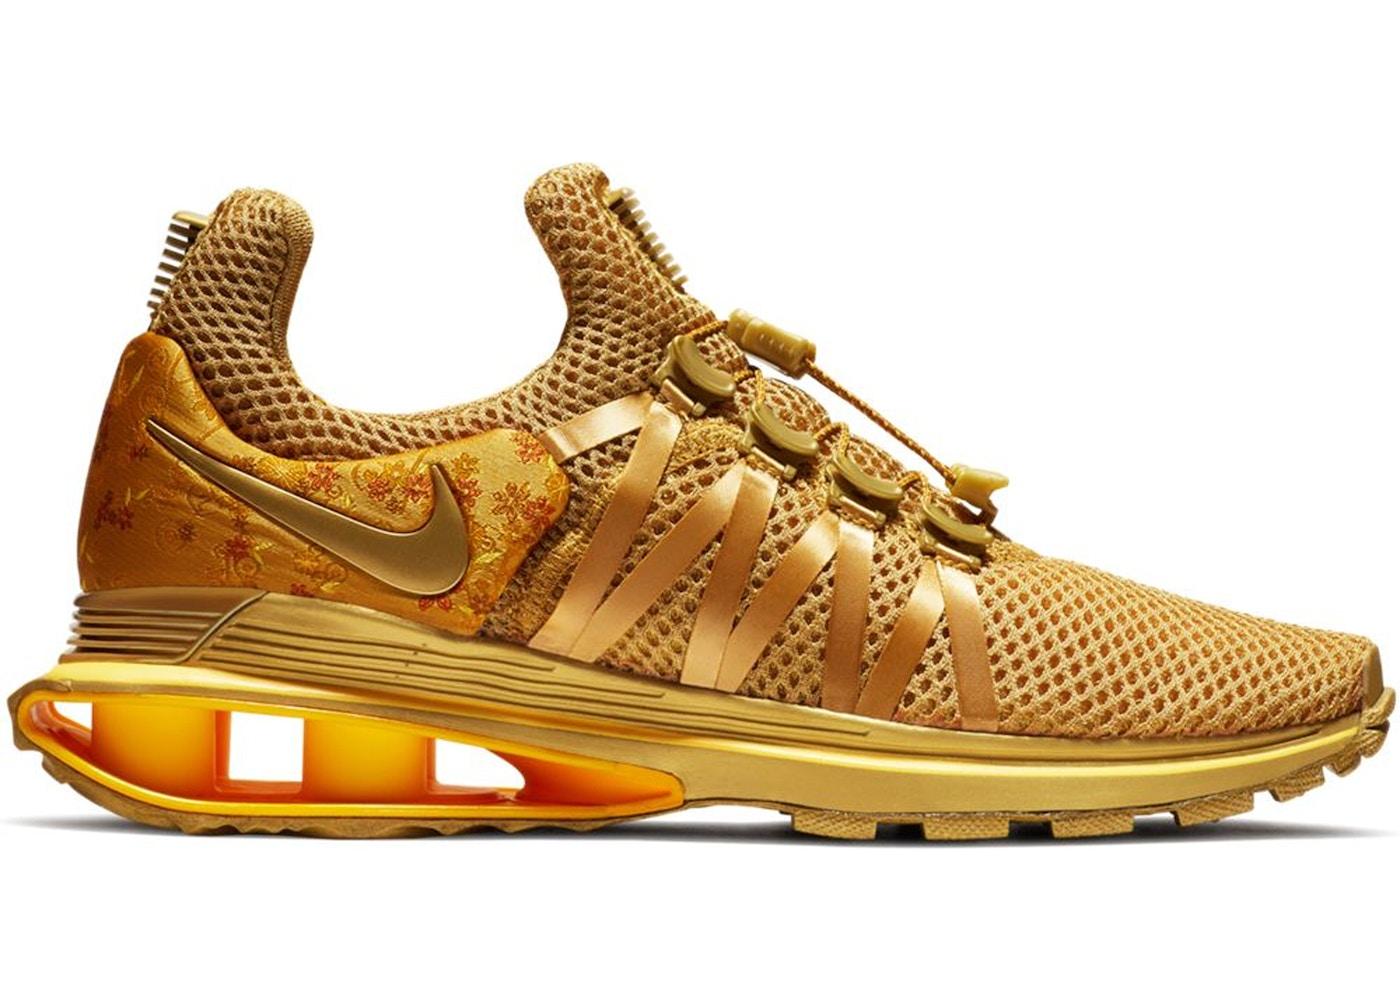 3390efc3bf34 Nike Shox Gravity Metallic Gold (W) - AQ8554-700